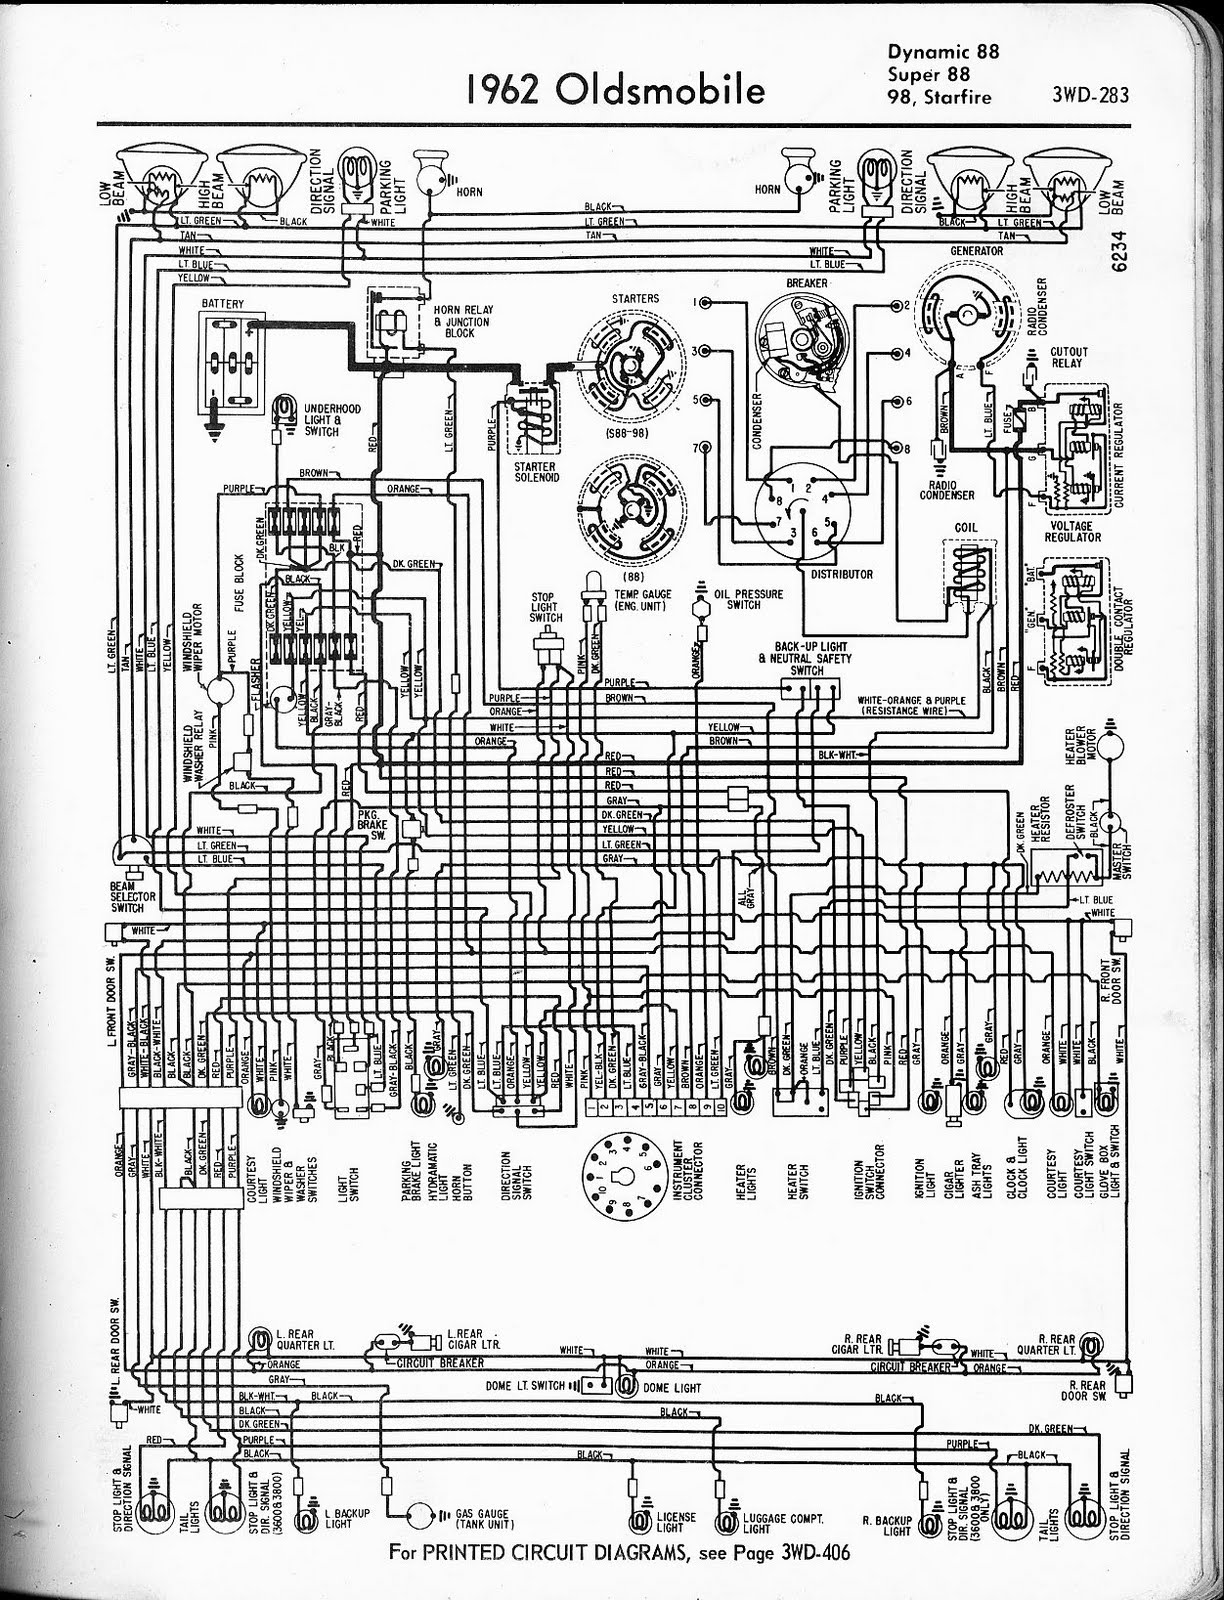 1958 oldsmobile wiring diagram trusted wiring diagrams u2022 rh sivamuni com 1998 oldsmobile 88 wiring  [ 1224 x 1600 Pixel ]